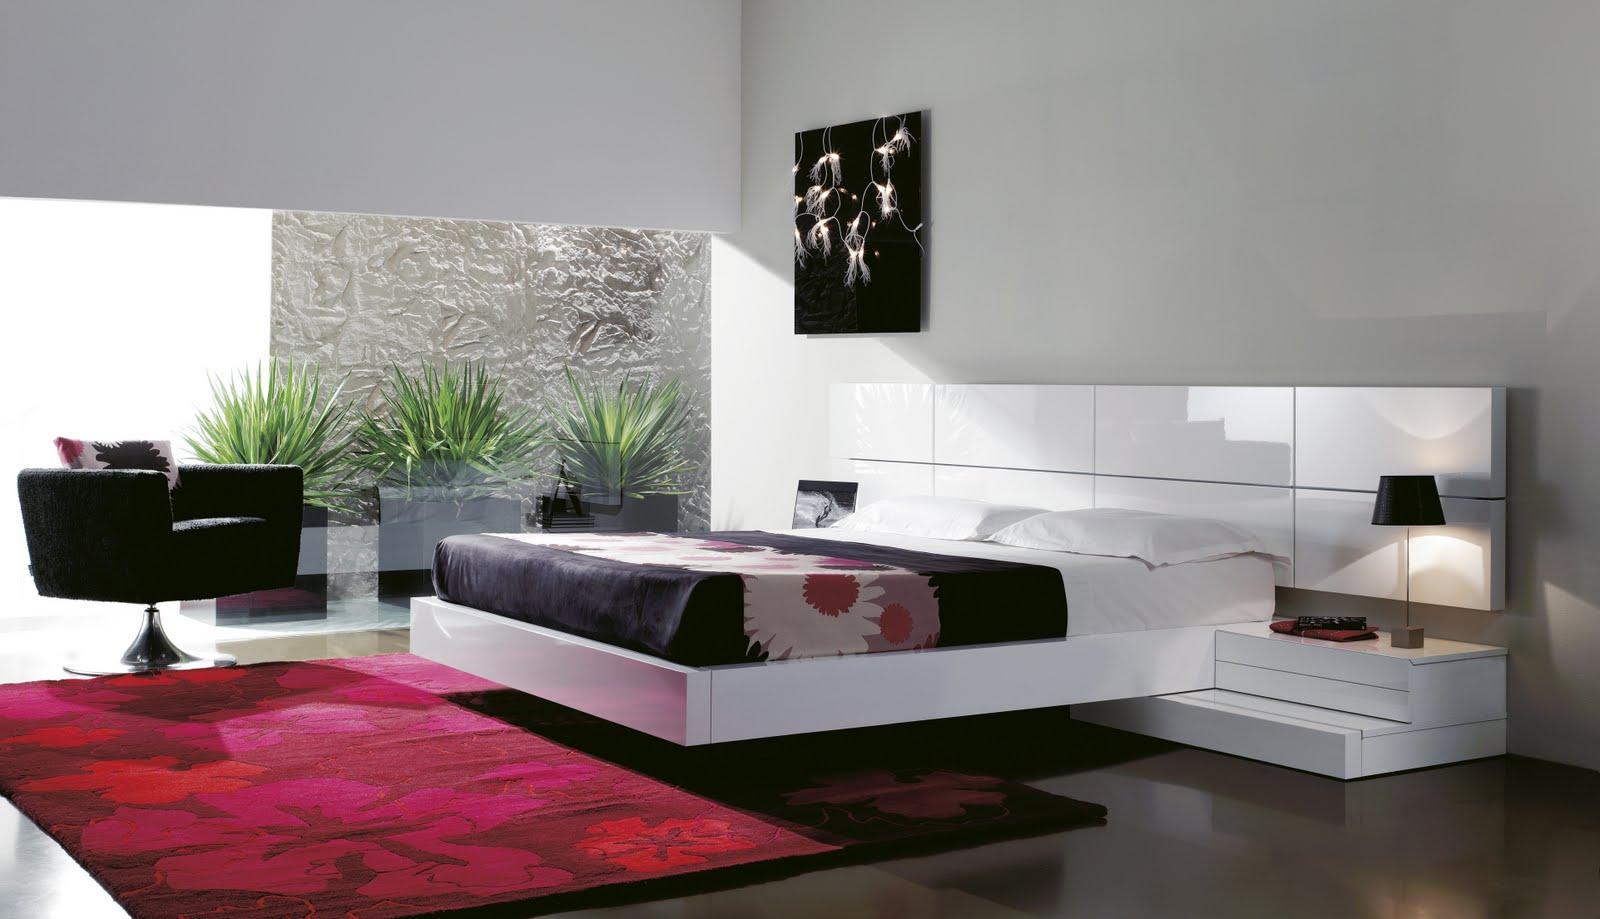 Dormitorios de matrimonio living for Decoracion dormitorio matrimonio blanco